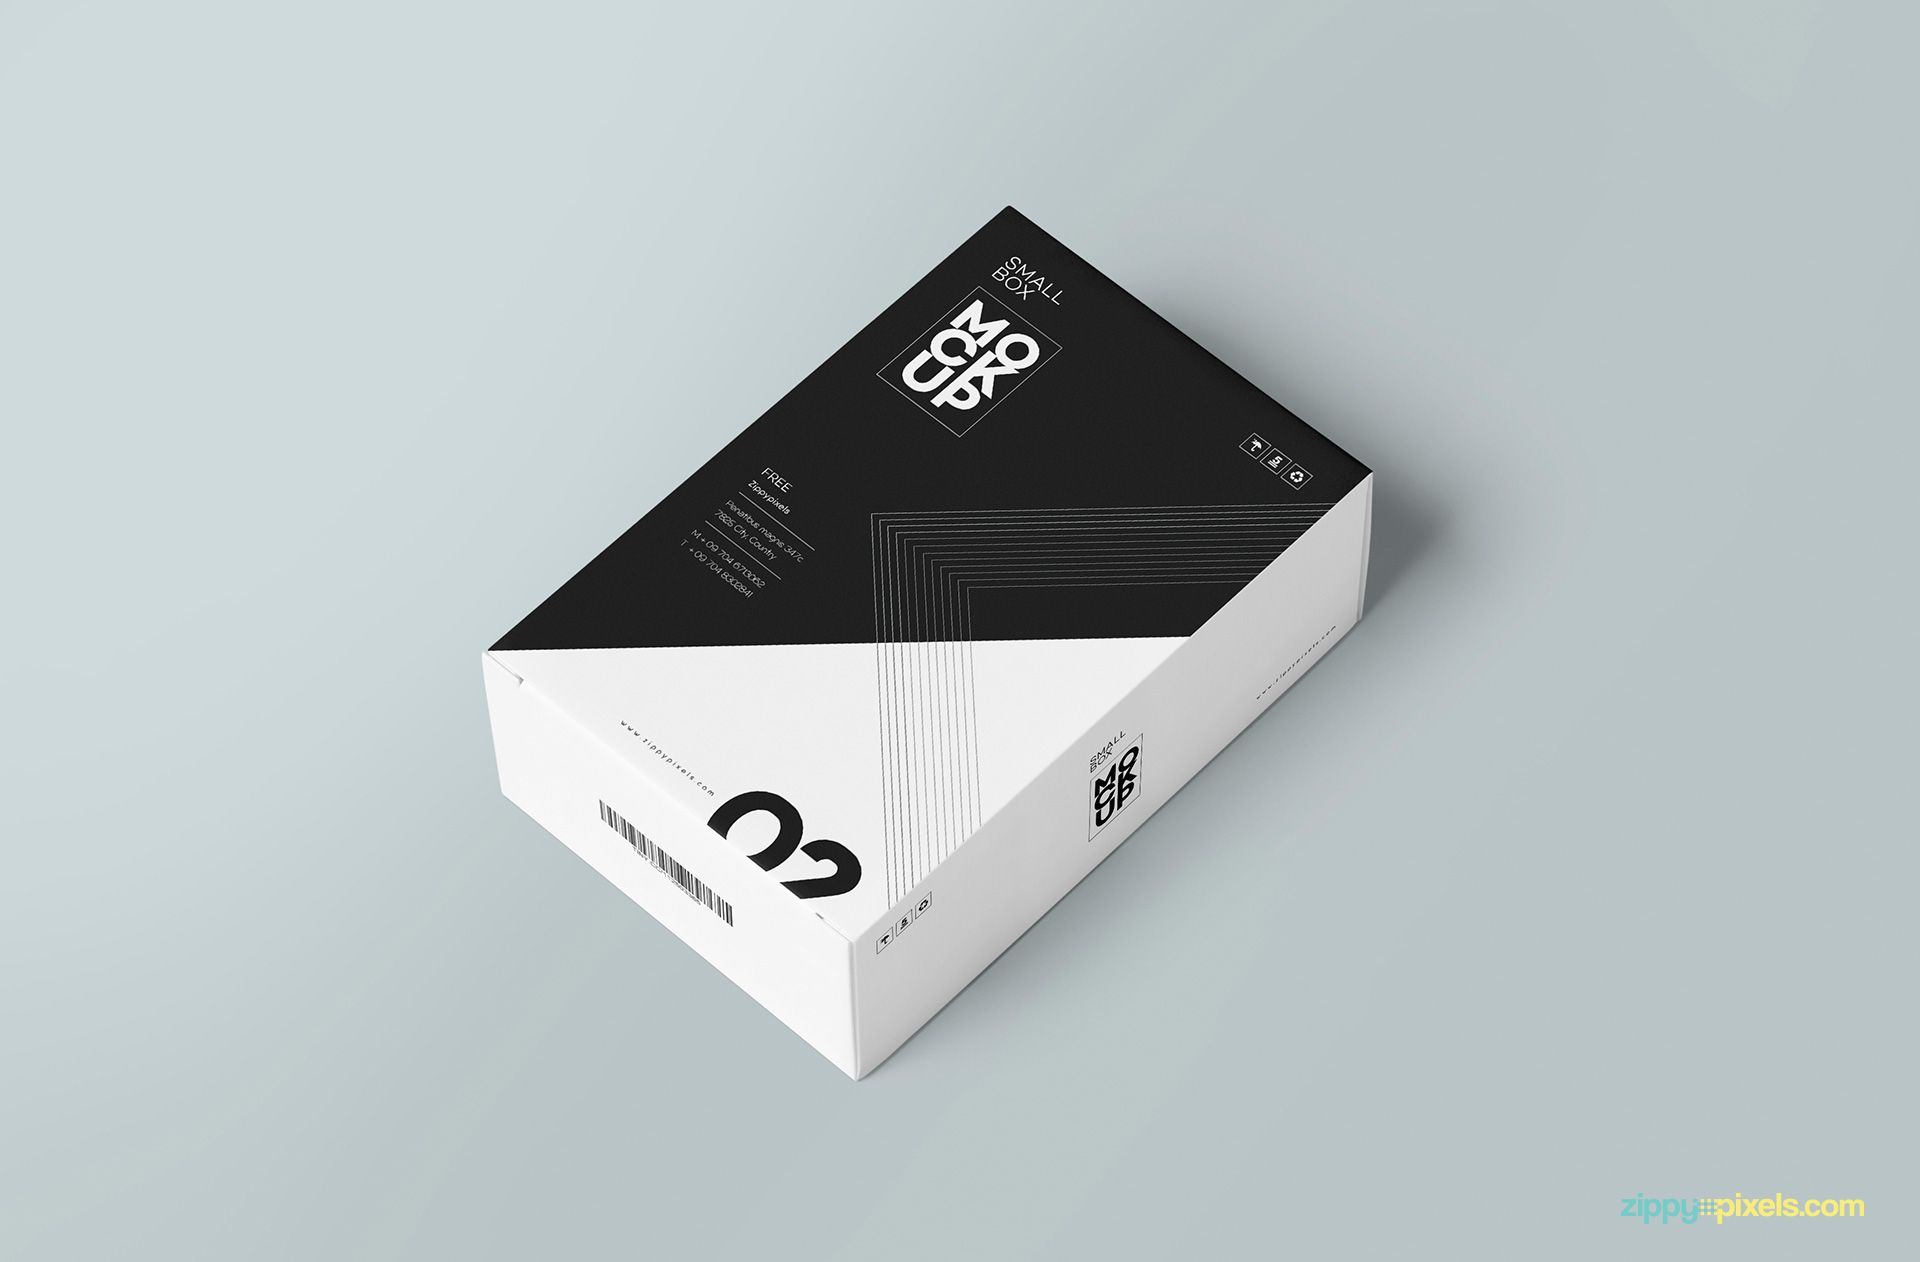 Download Free Customizable Card Box Mockup Zippypixels Packaging Template Design Box Mockup Packaging Template